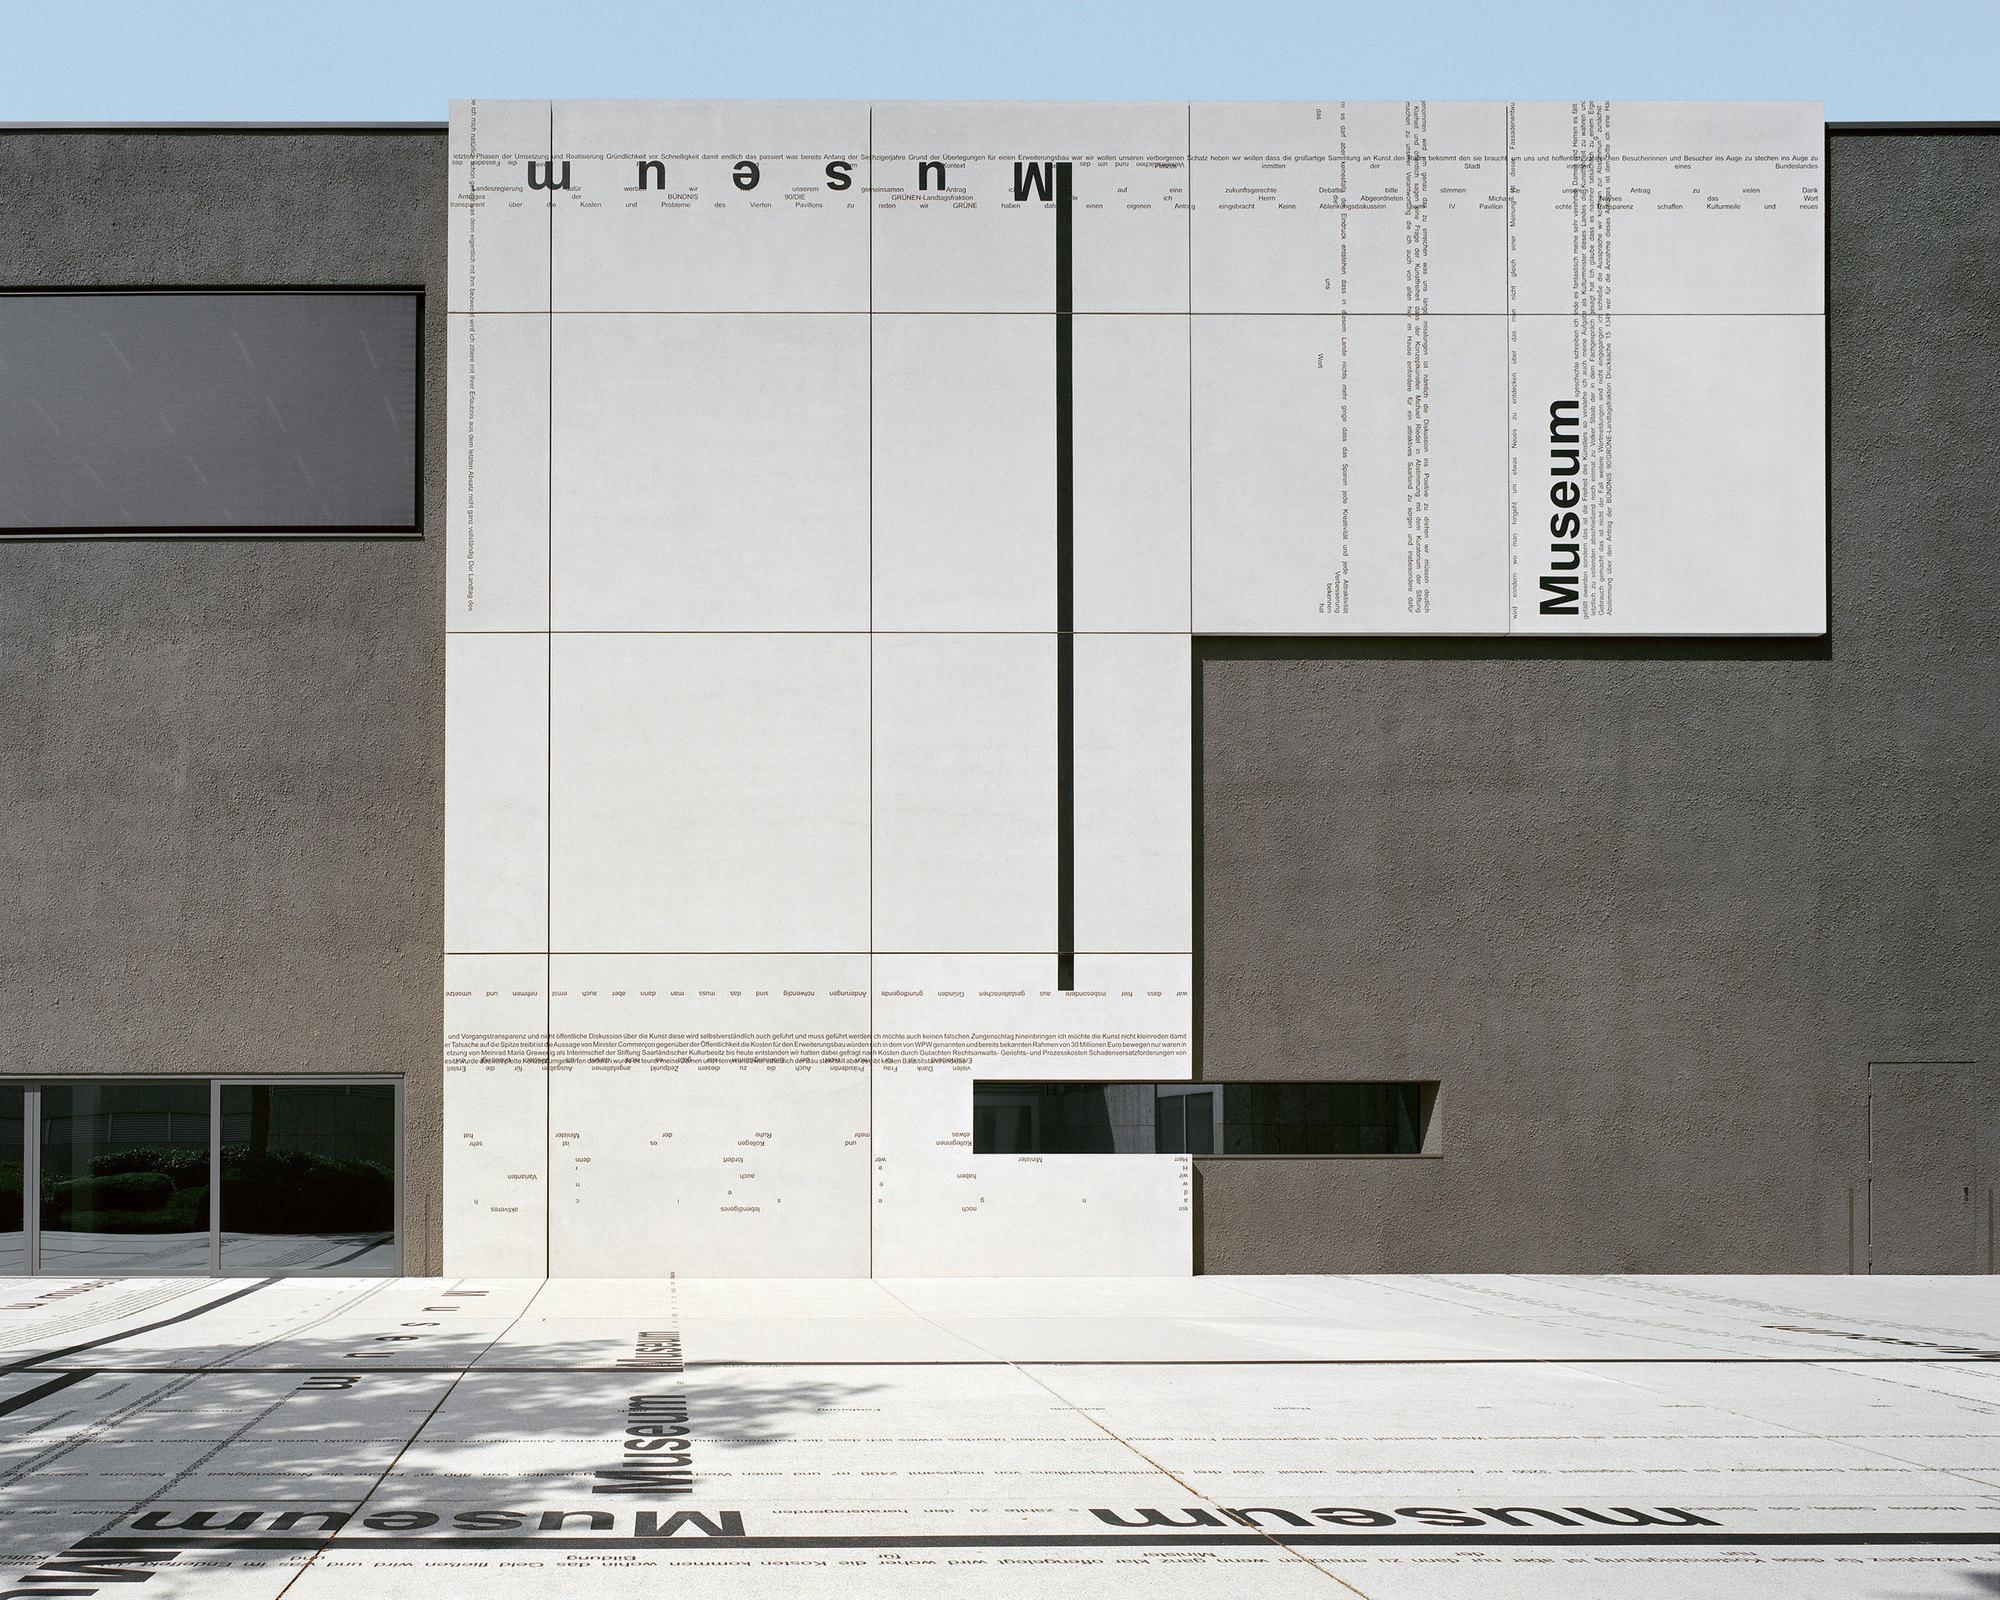 Extension Moderne Galerie Saarlandmuseum Kuehn Malvezzi Archdaily